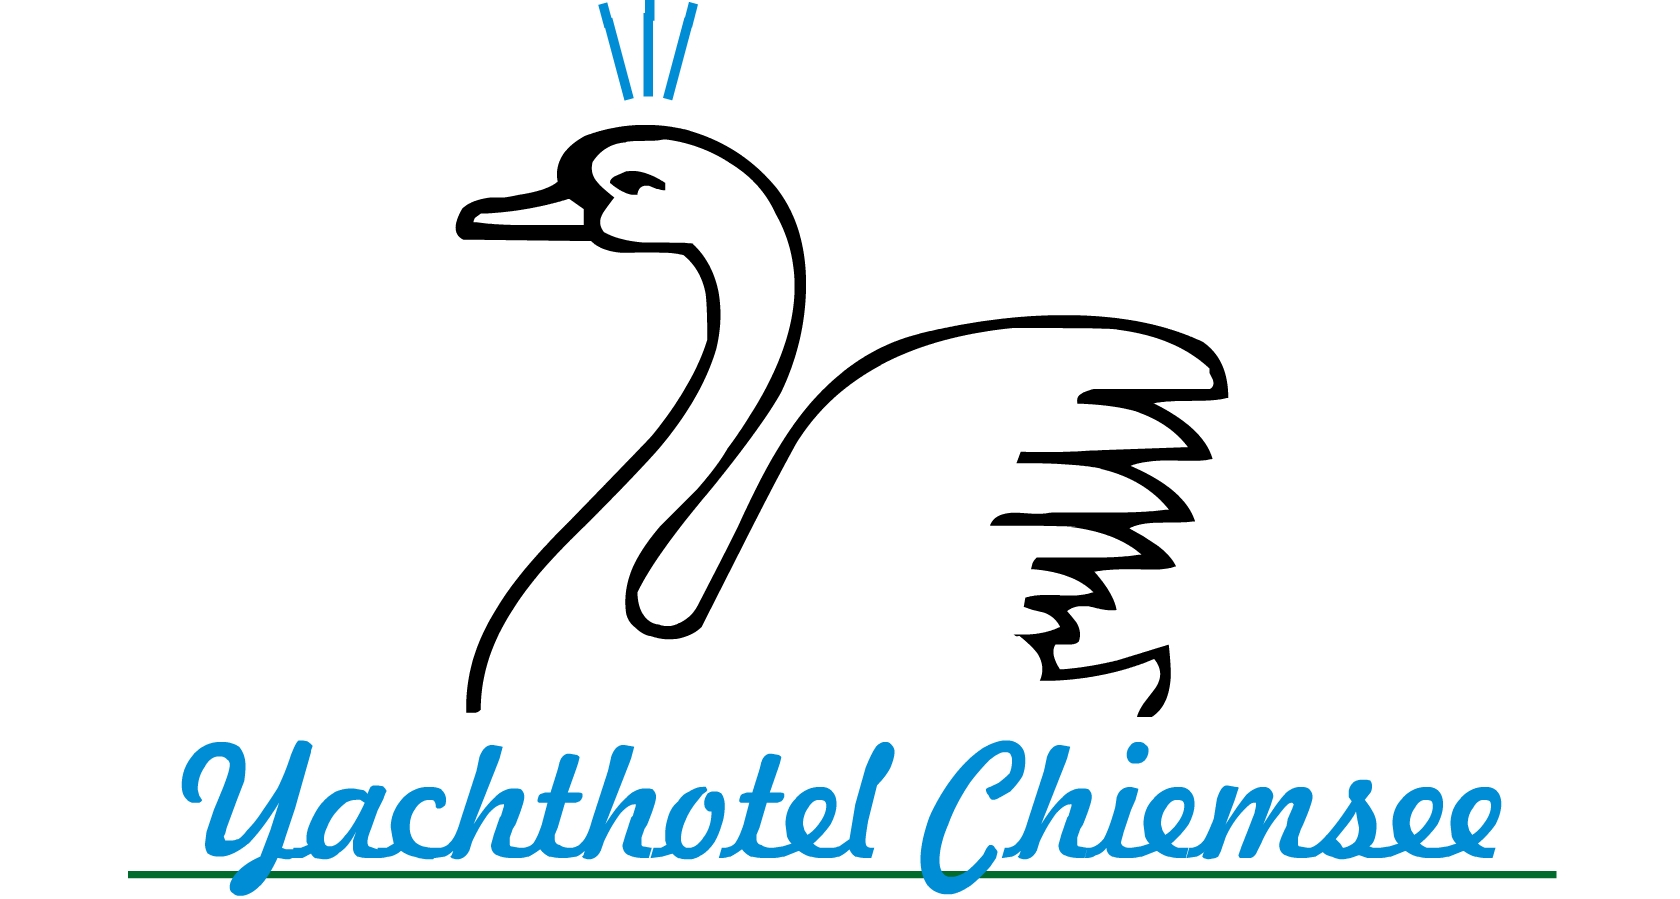 Yachthotel Chiemsee GmbH